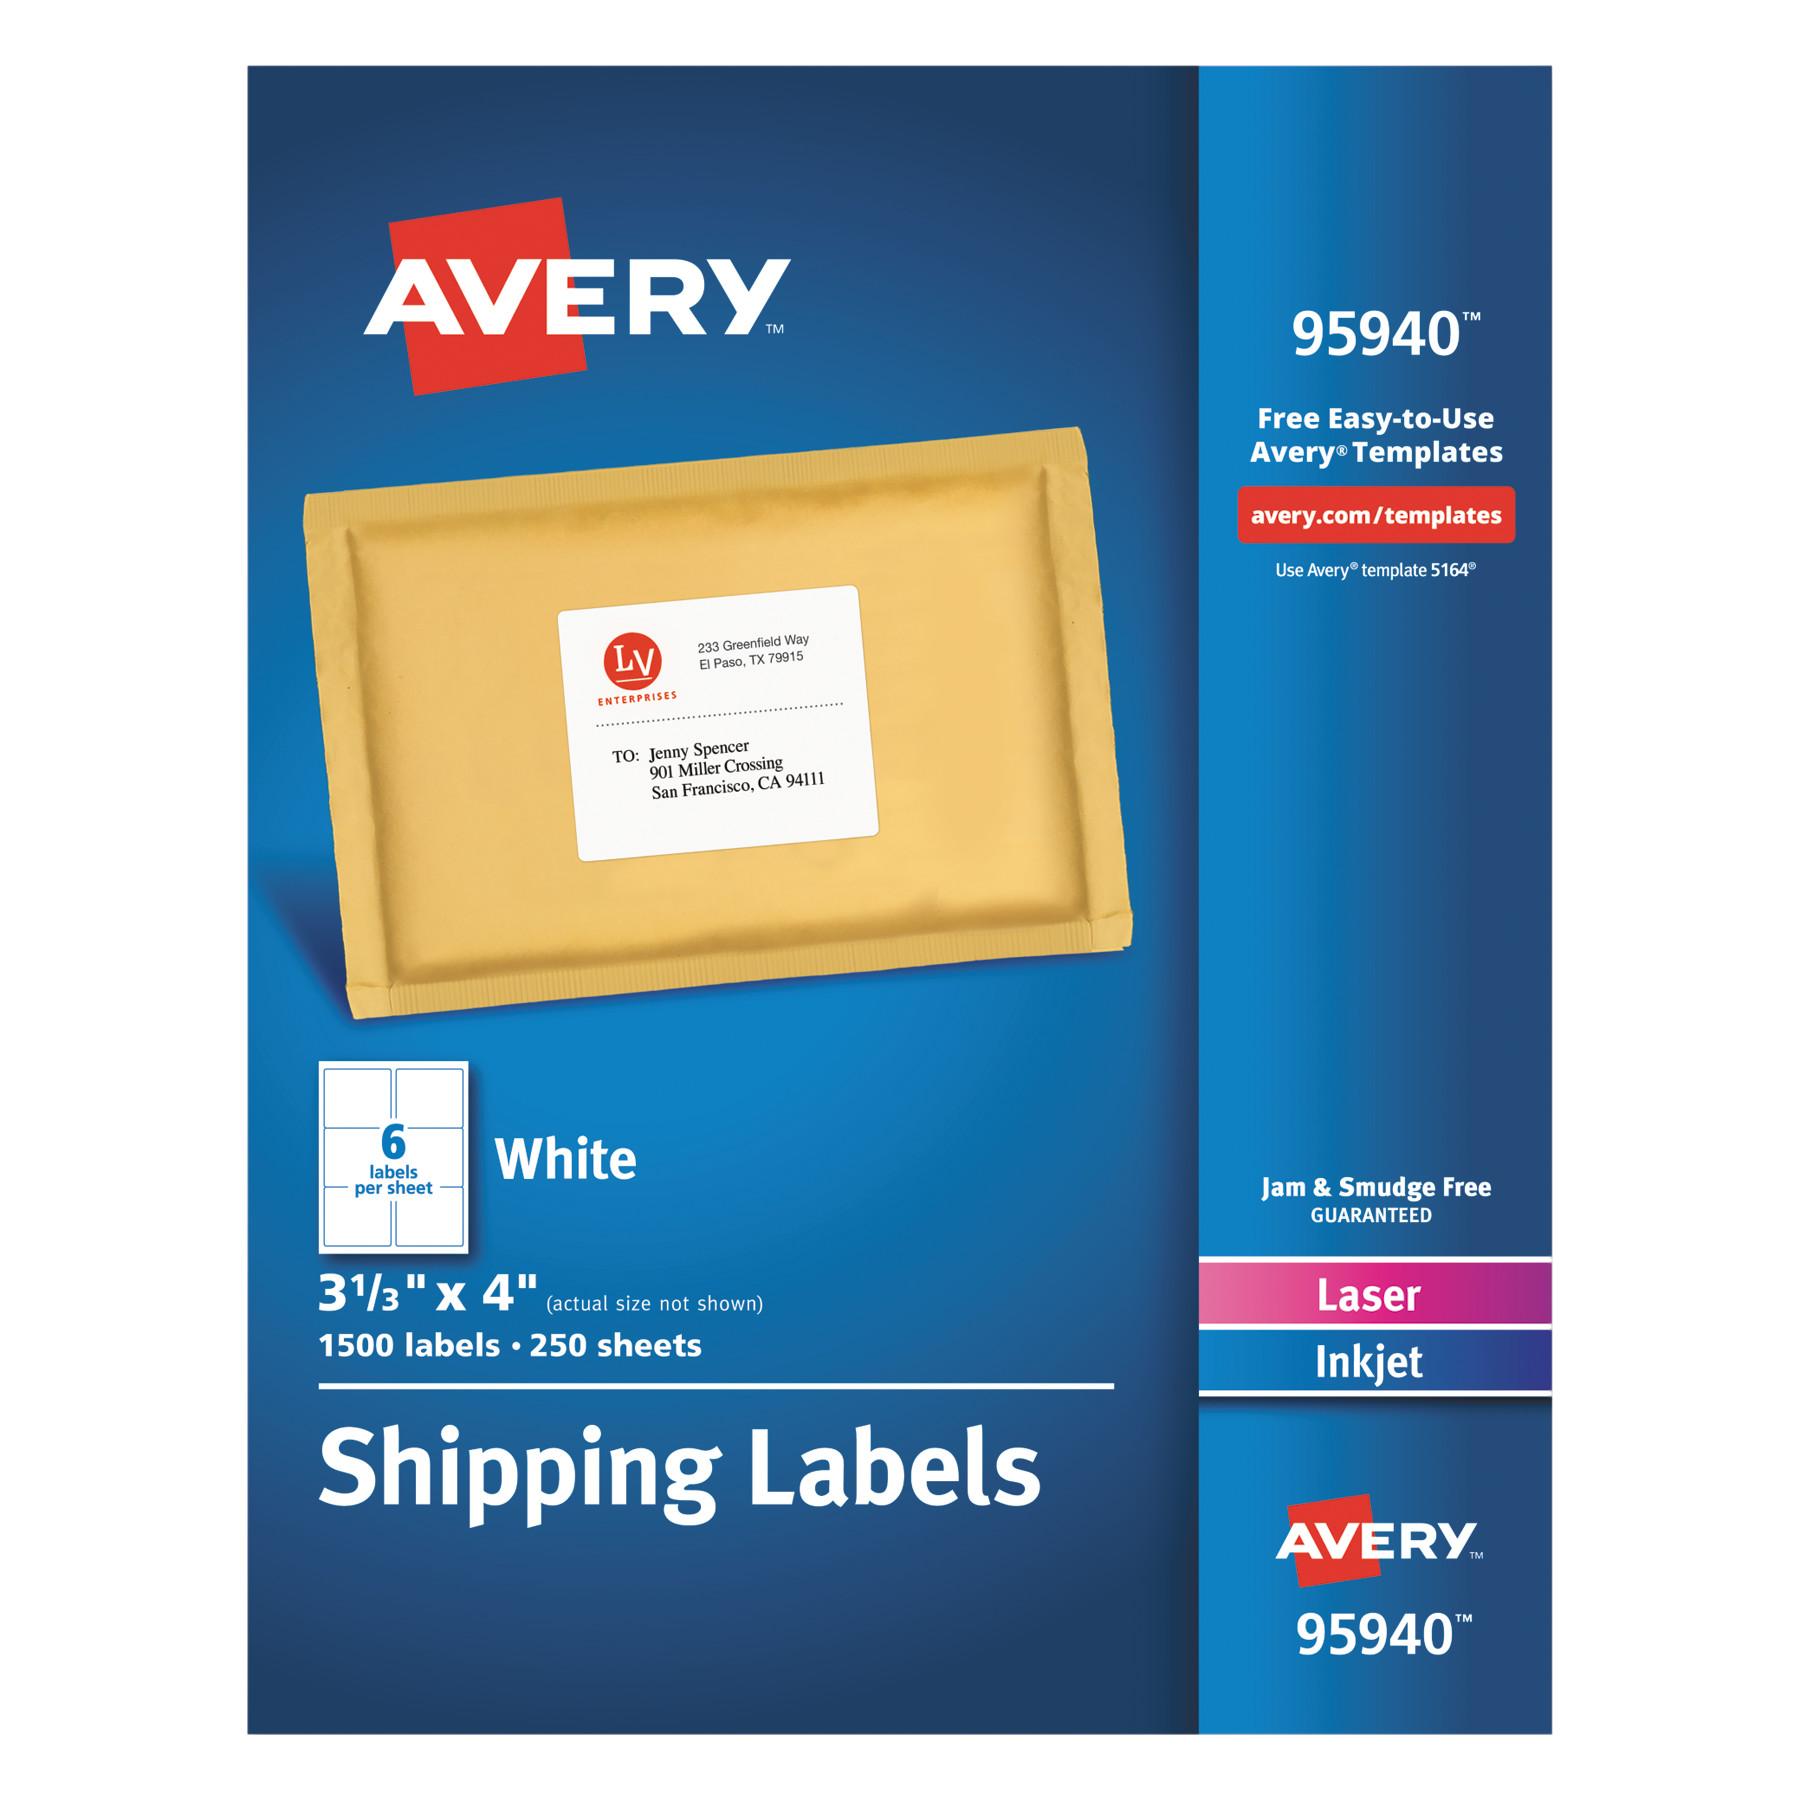 Avery White Shipping Labels, Inkjet/Laser, 3 1/3 x 4, White, 1500/Box